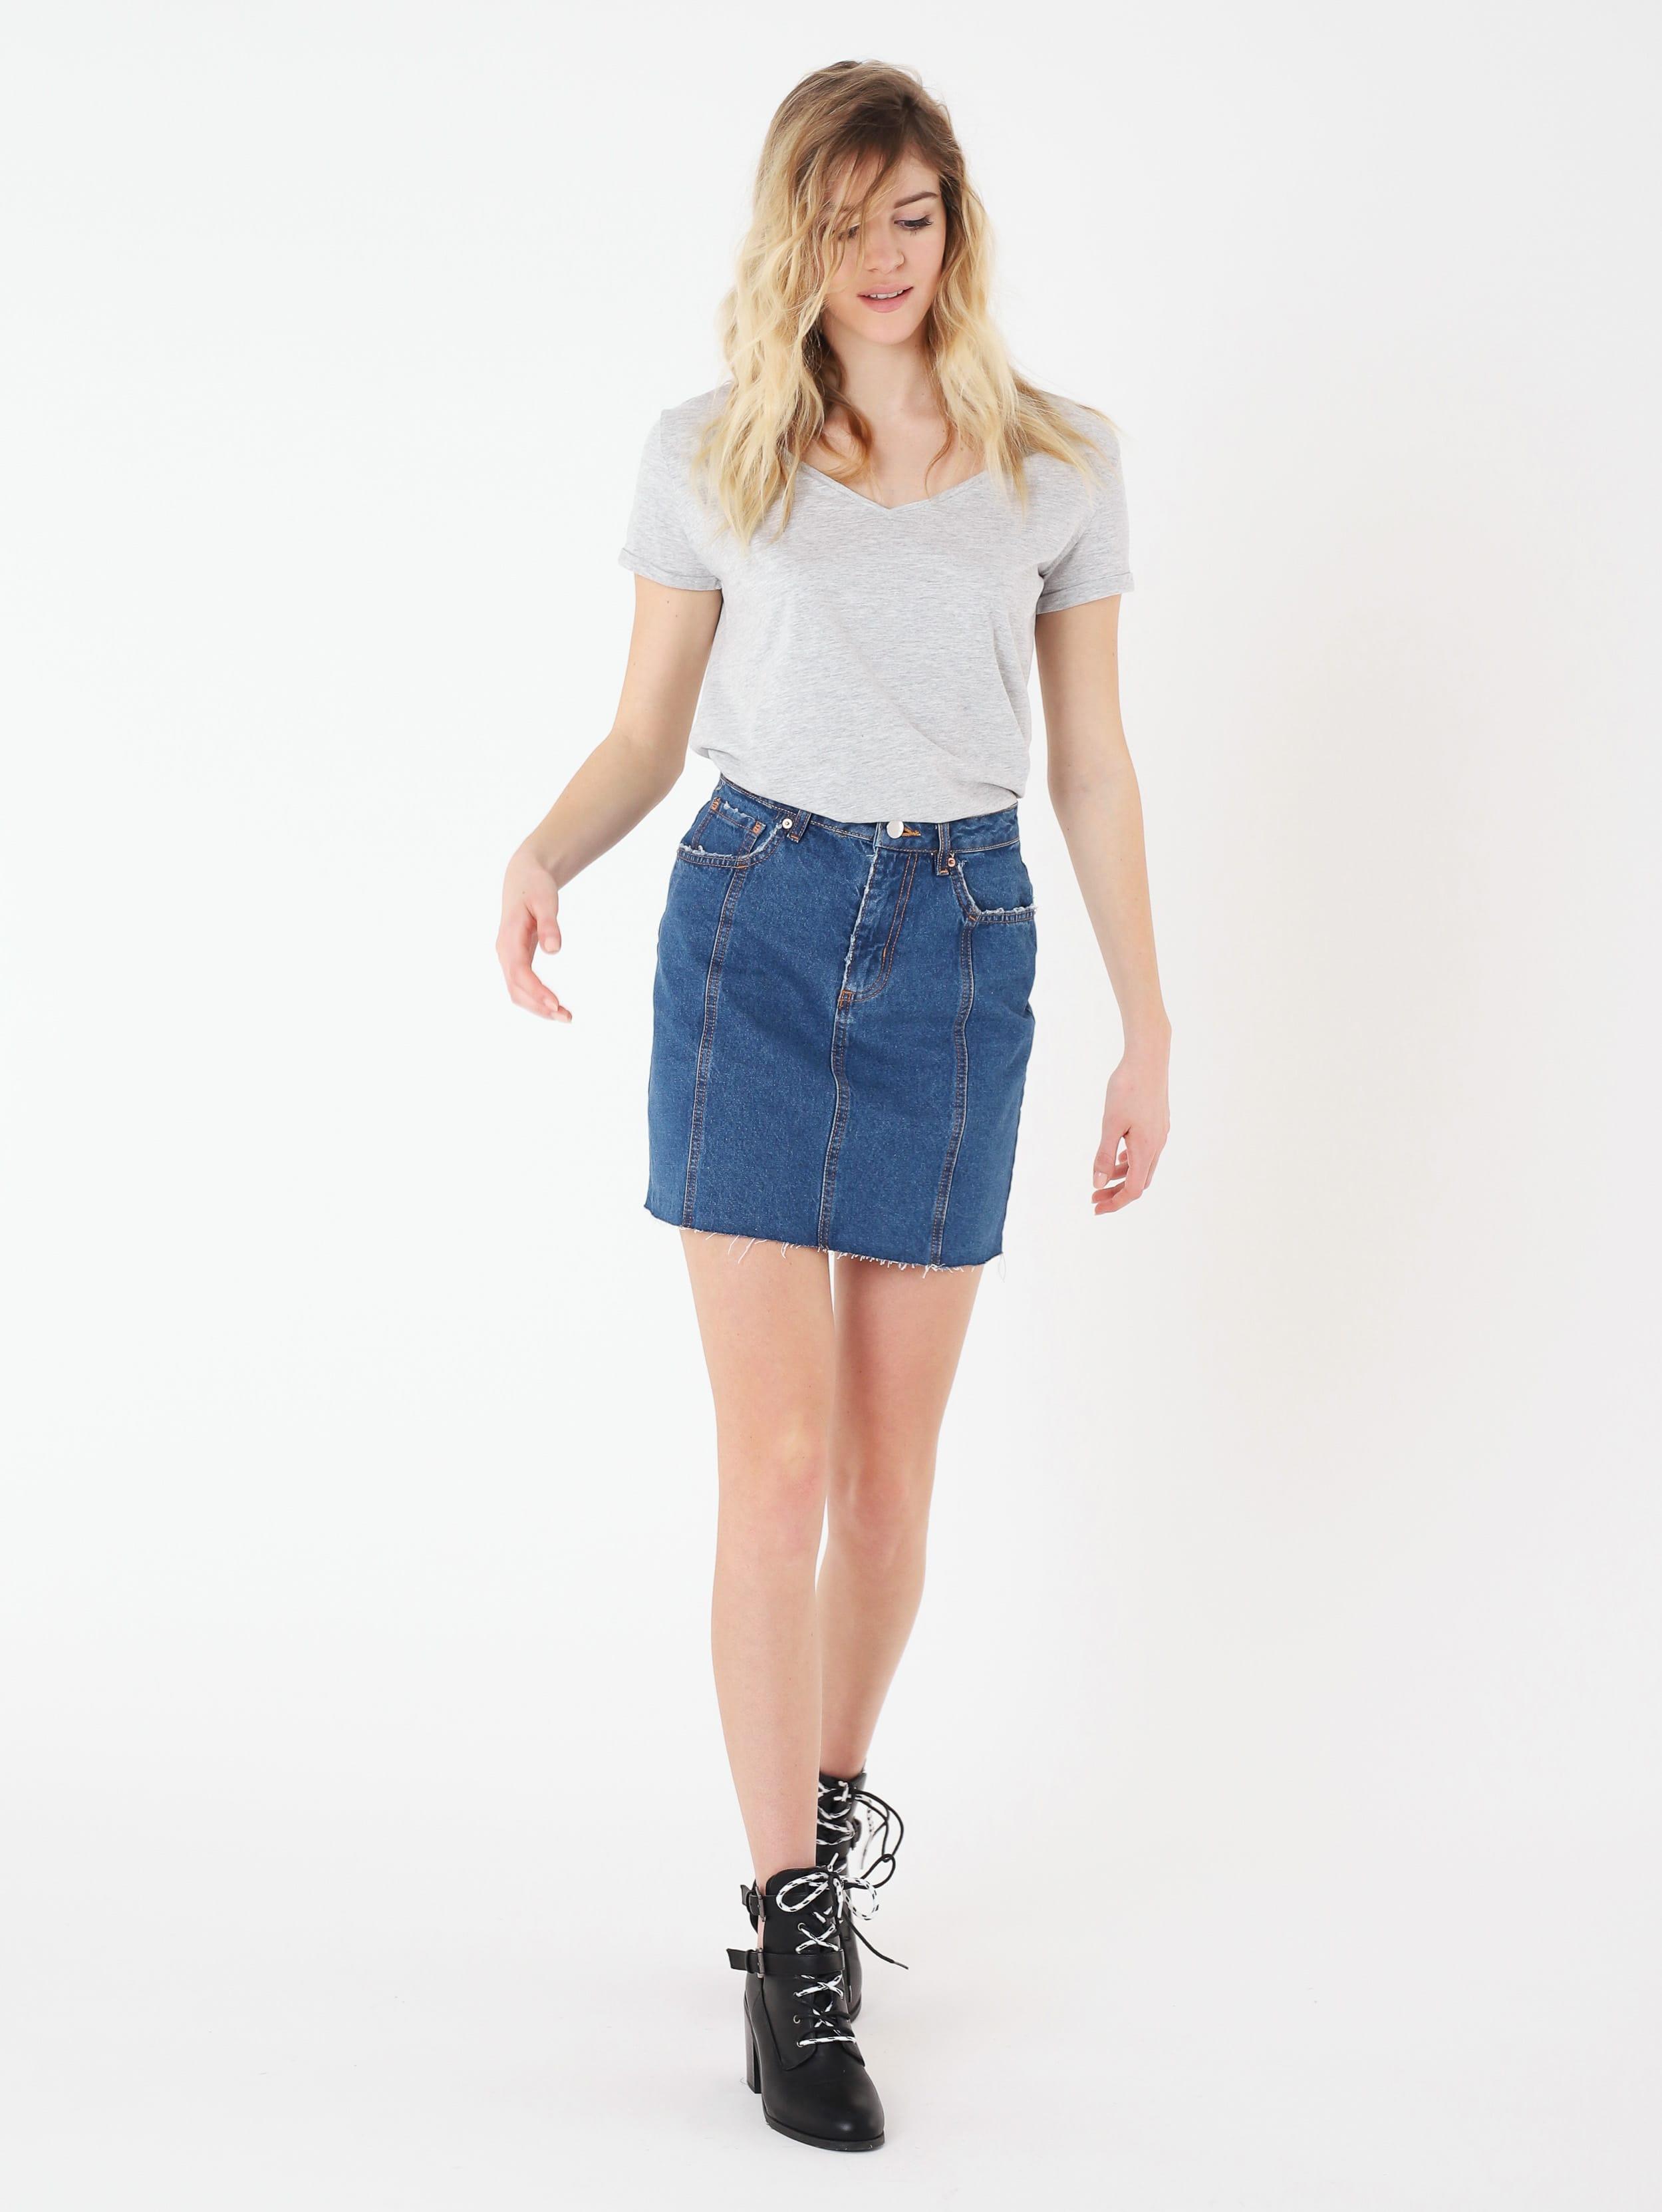 Gonna di jeans Terranova a 15,99 euro